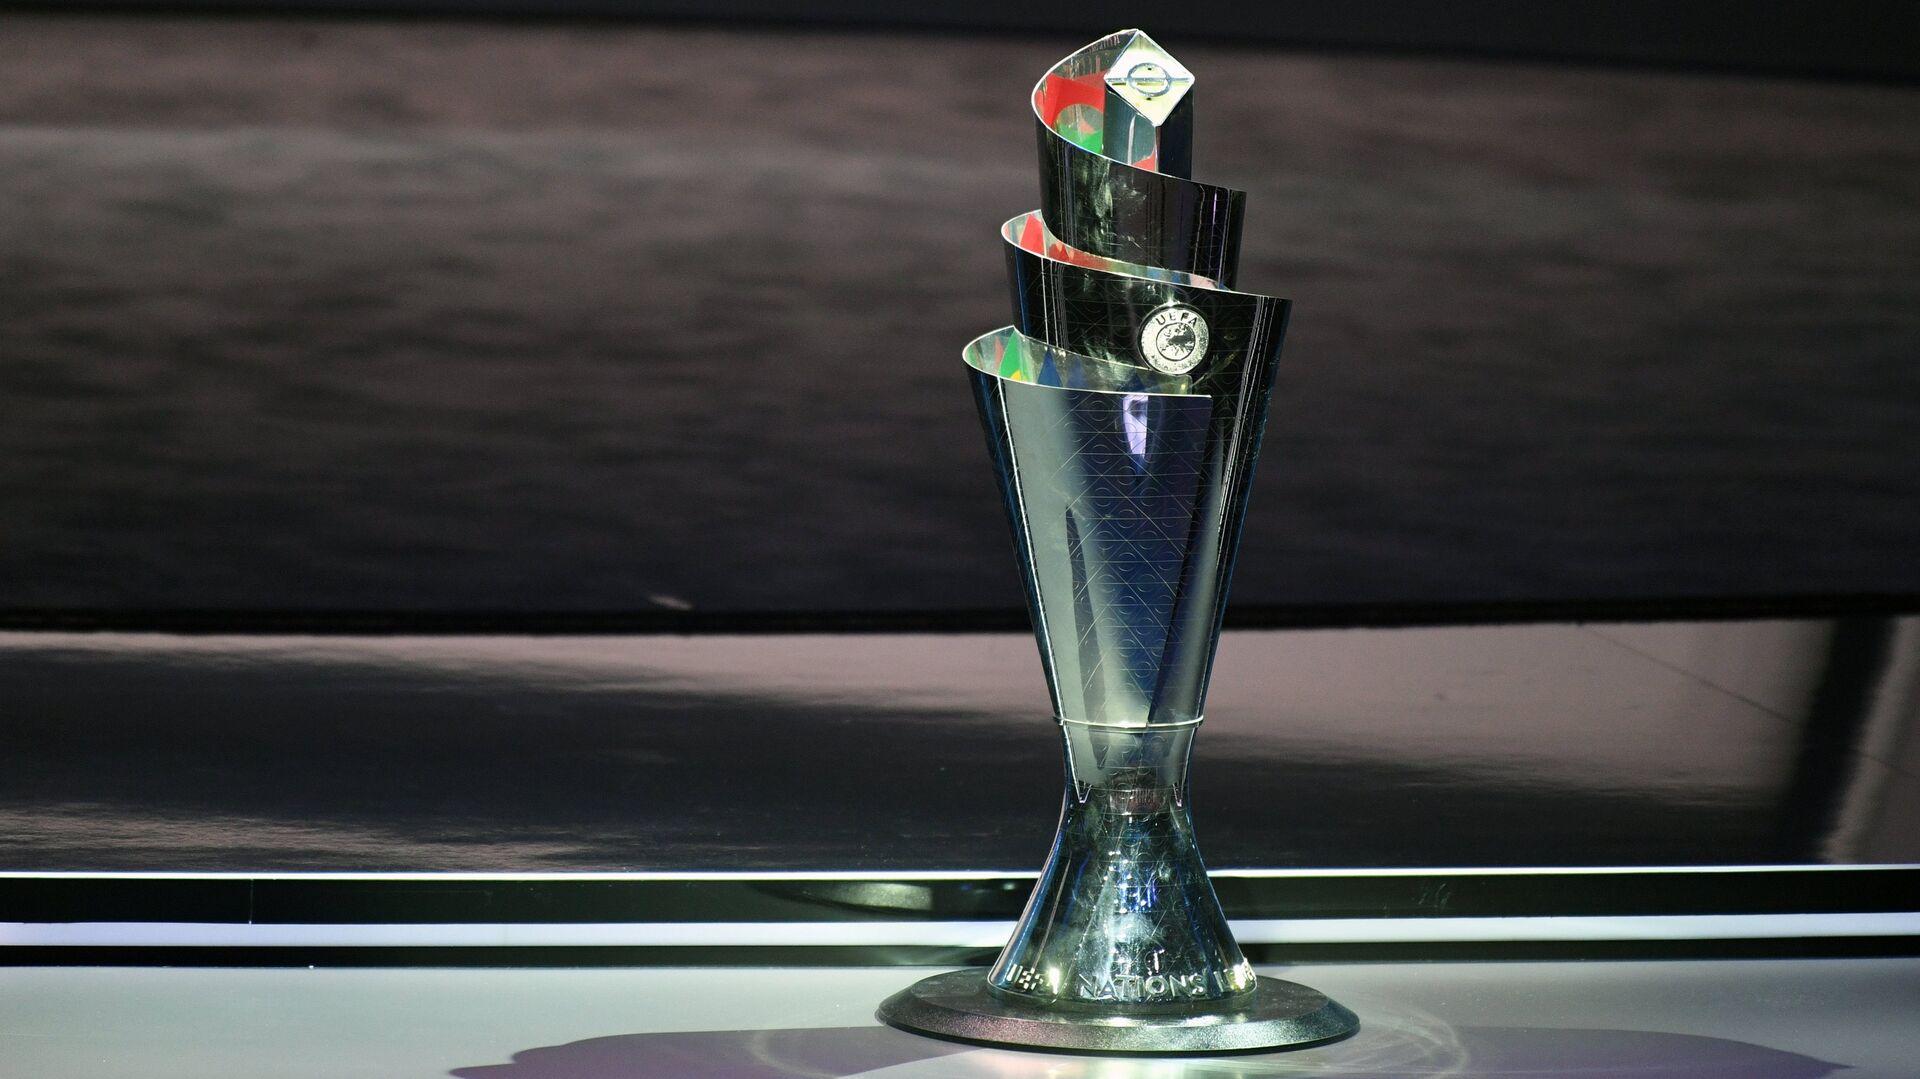 Кубок Лиги наций УЕФА - РИА Новости, 1920, 24.09.2020